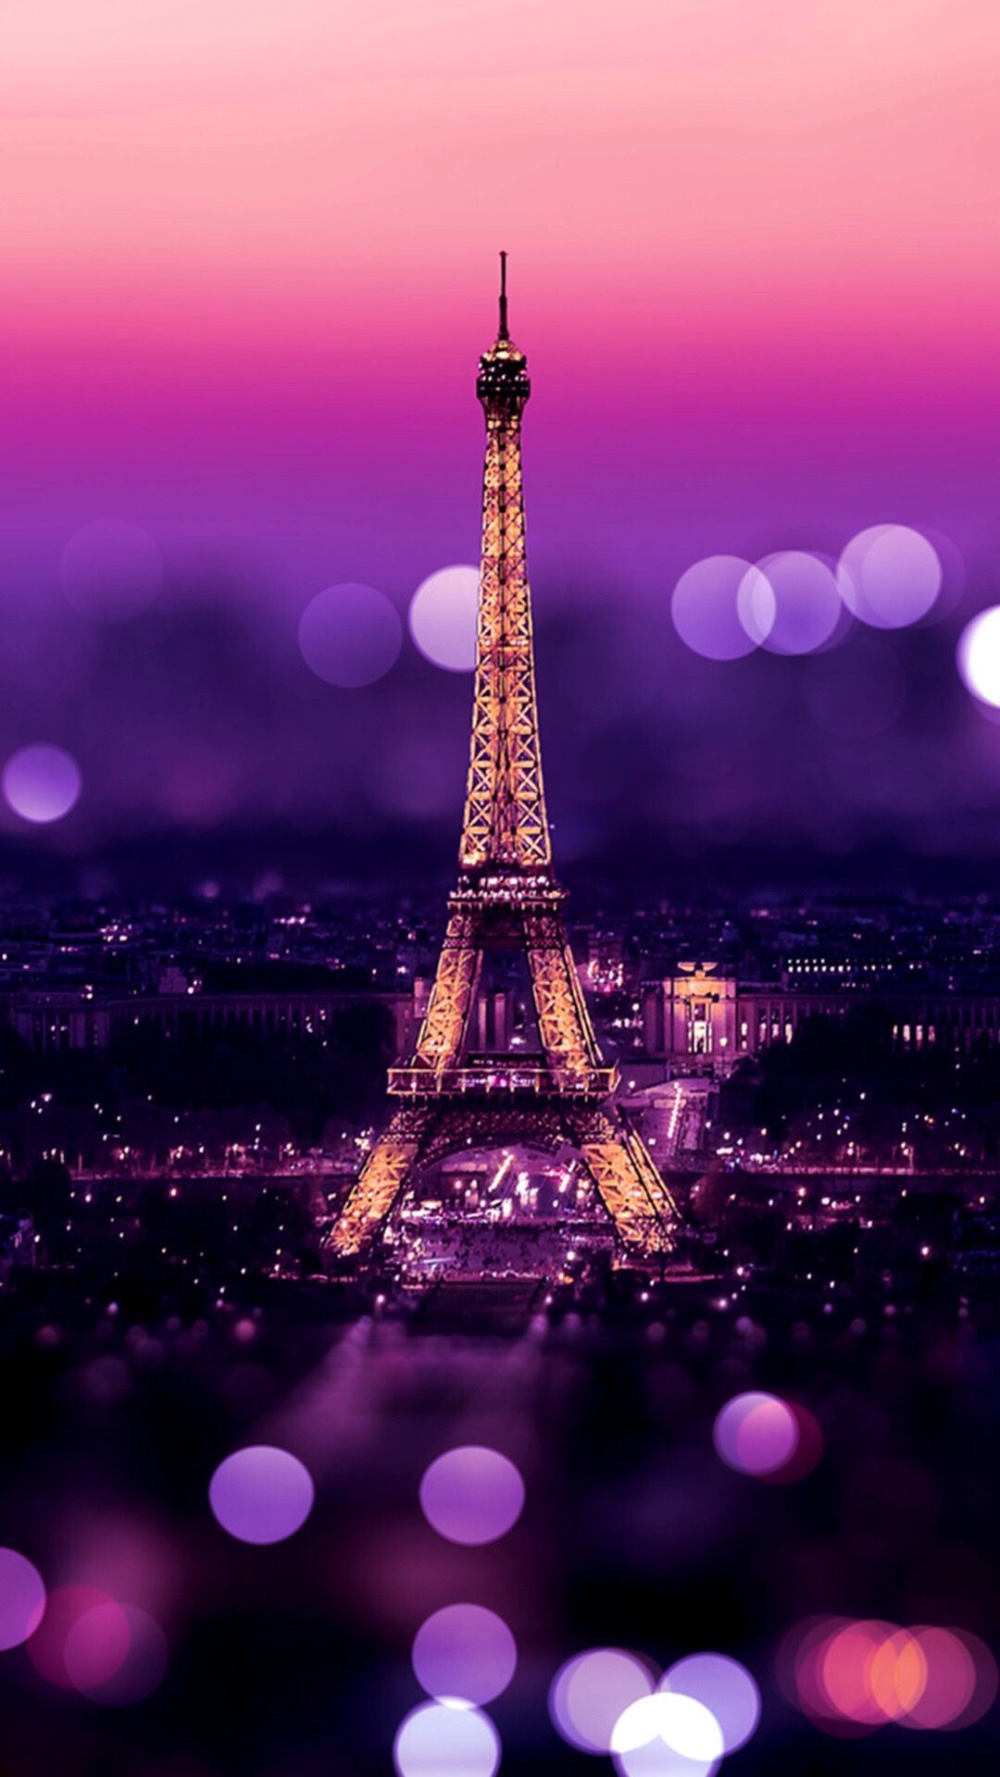 Girly Eiffel Tower Wallpaper 61 Images Paris Wallpaper Iphone Eiffel Tower Photography Paris Wallpaper